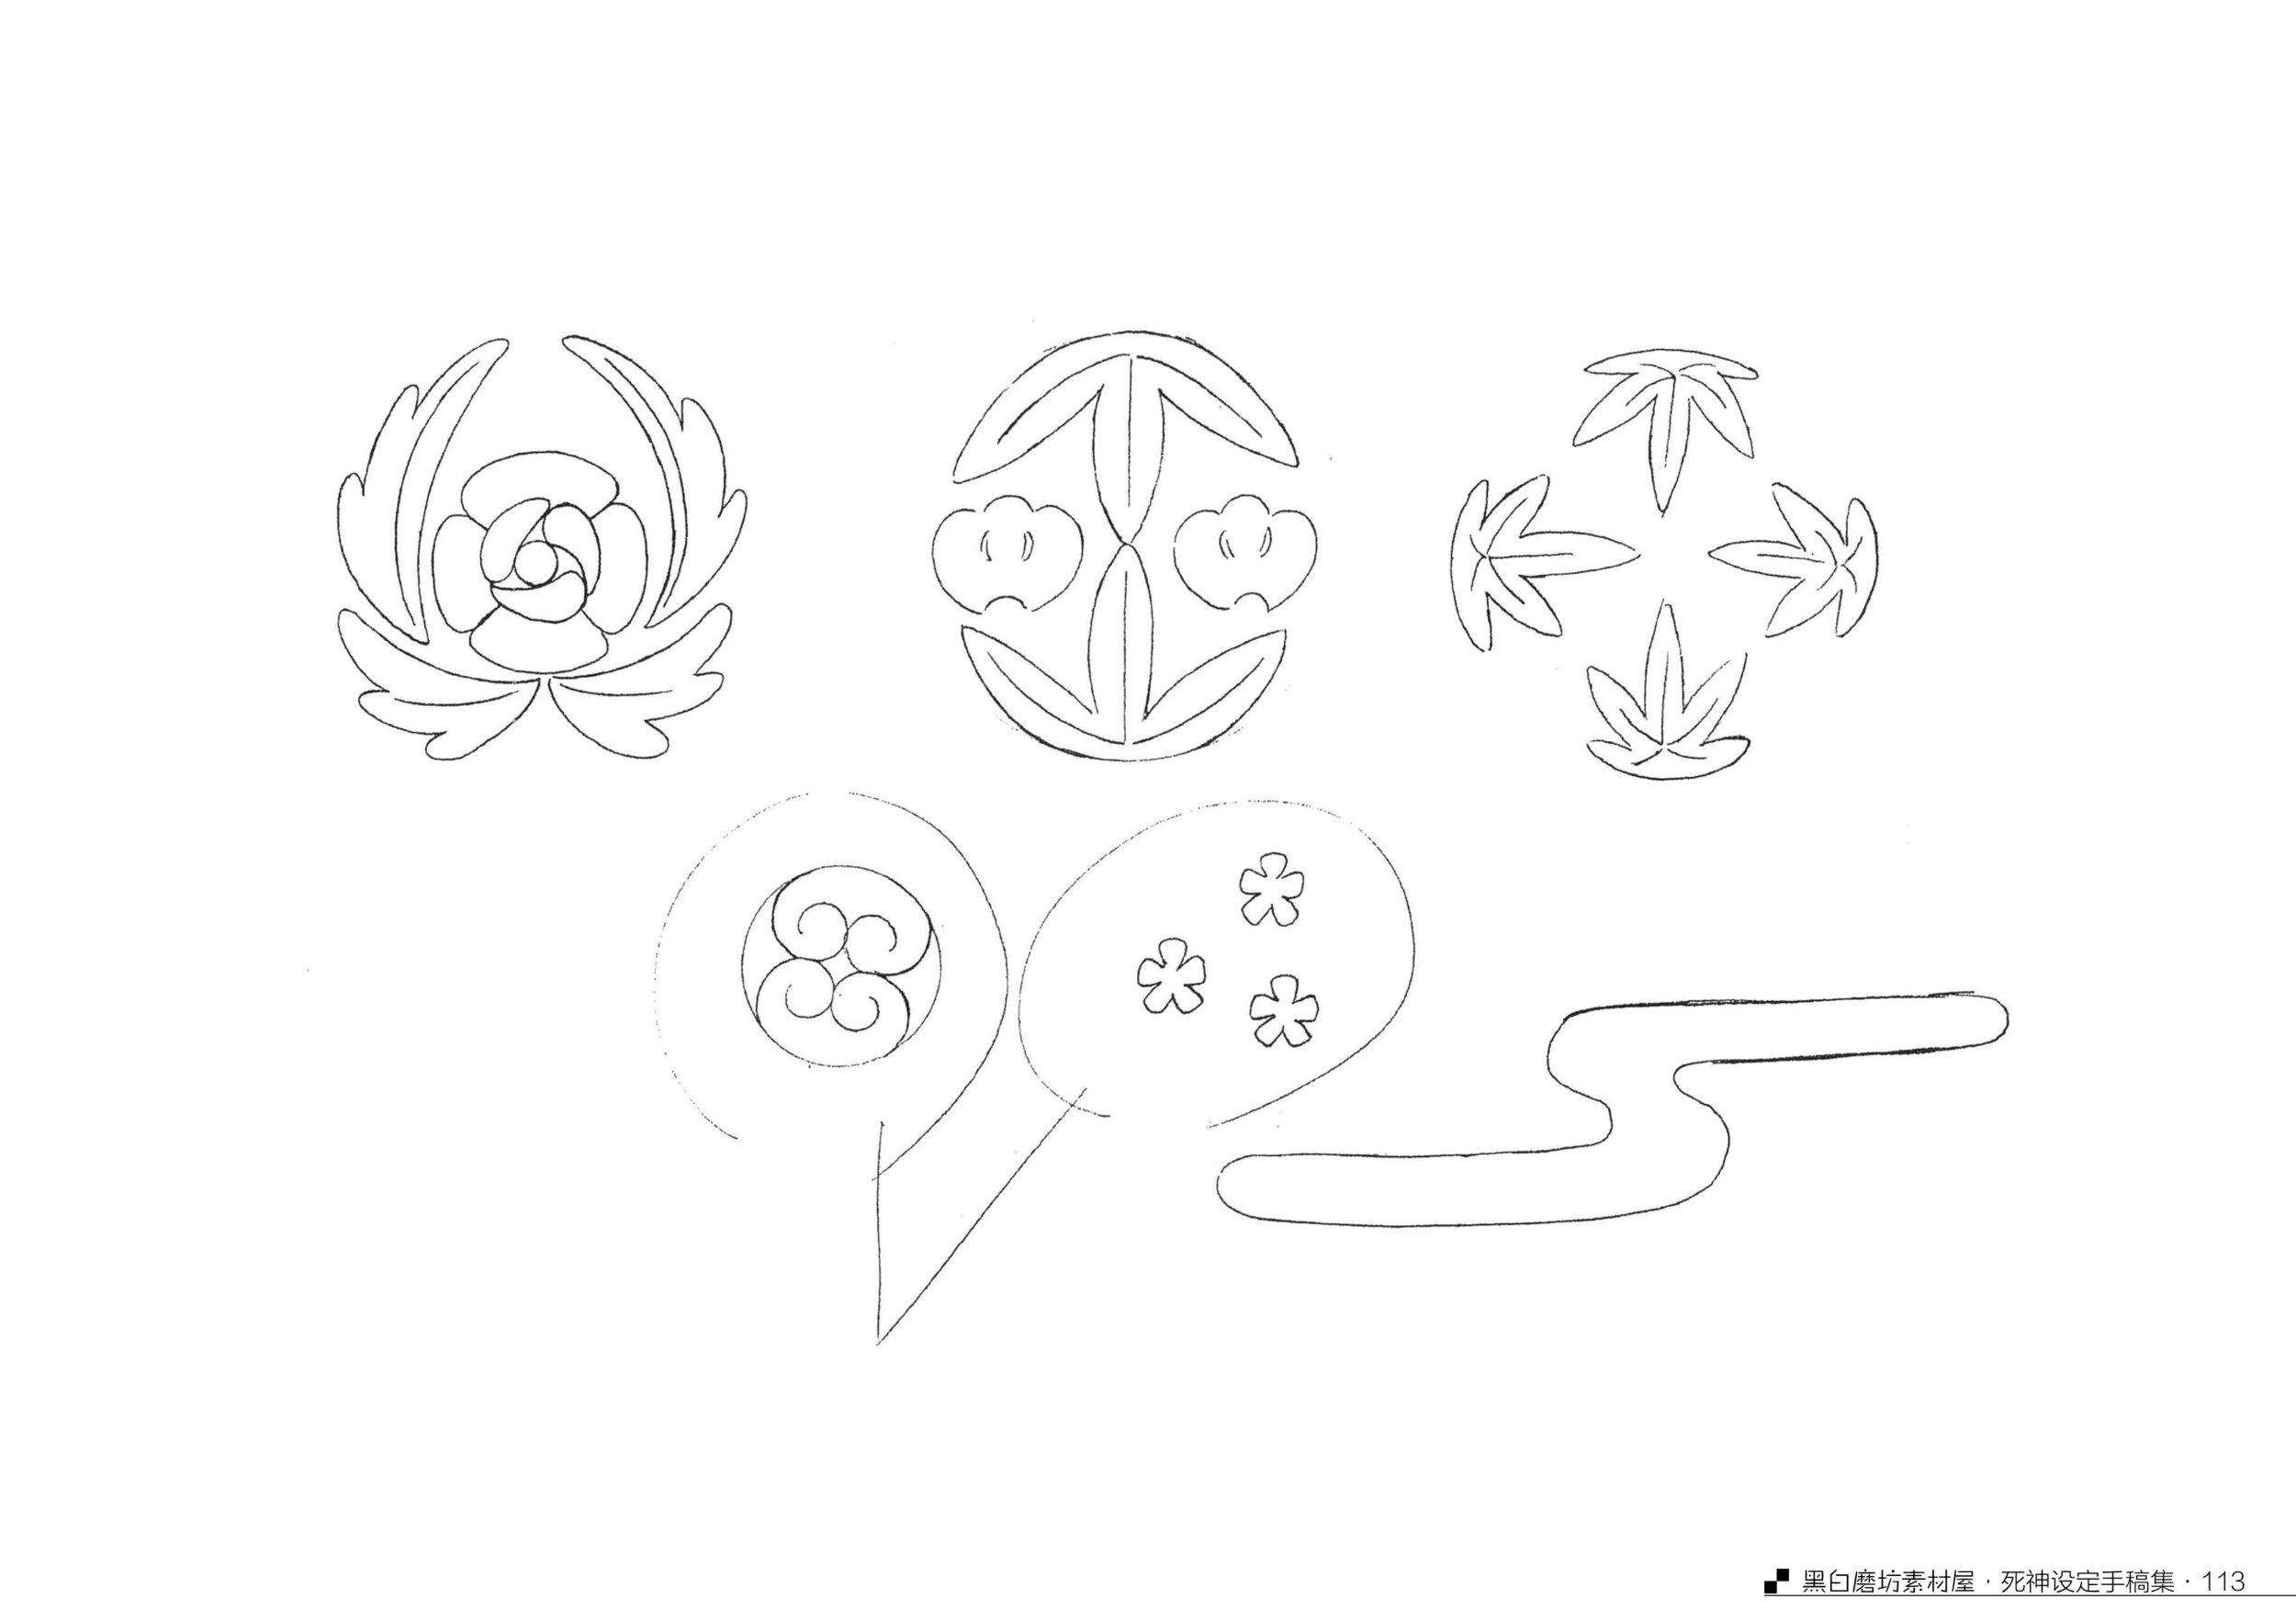 Art of the Bleach A - 100.jpg